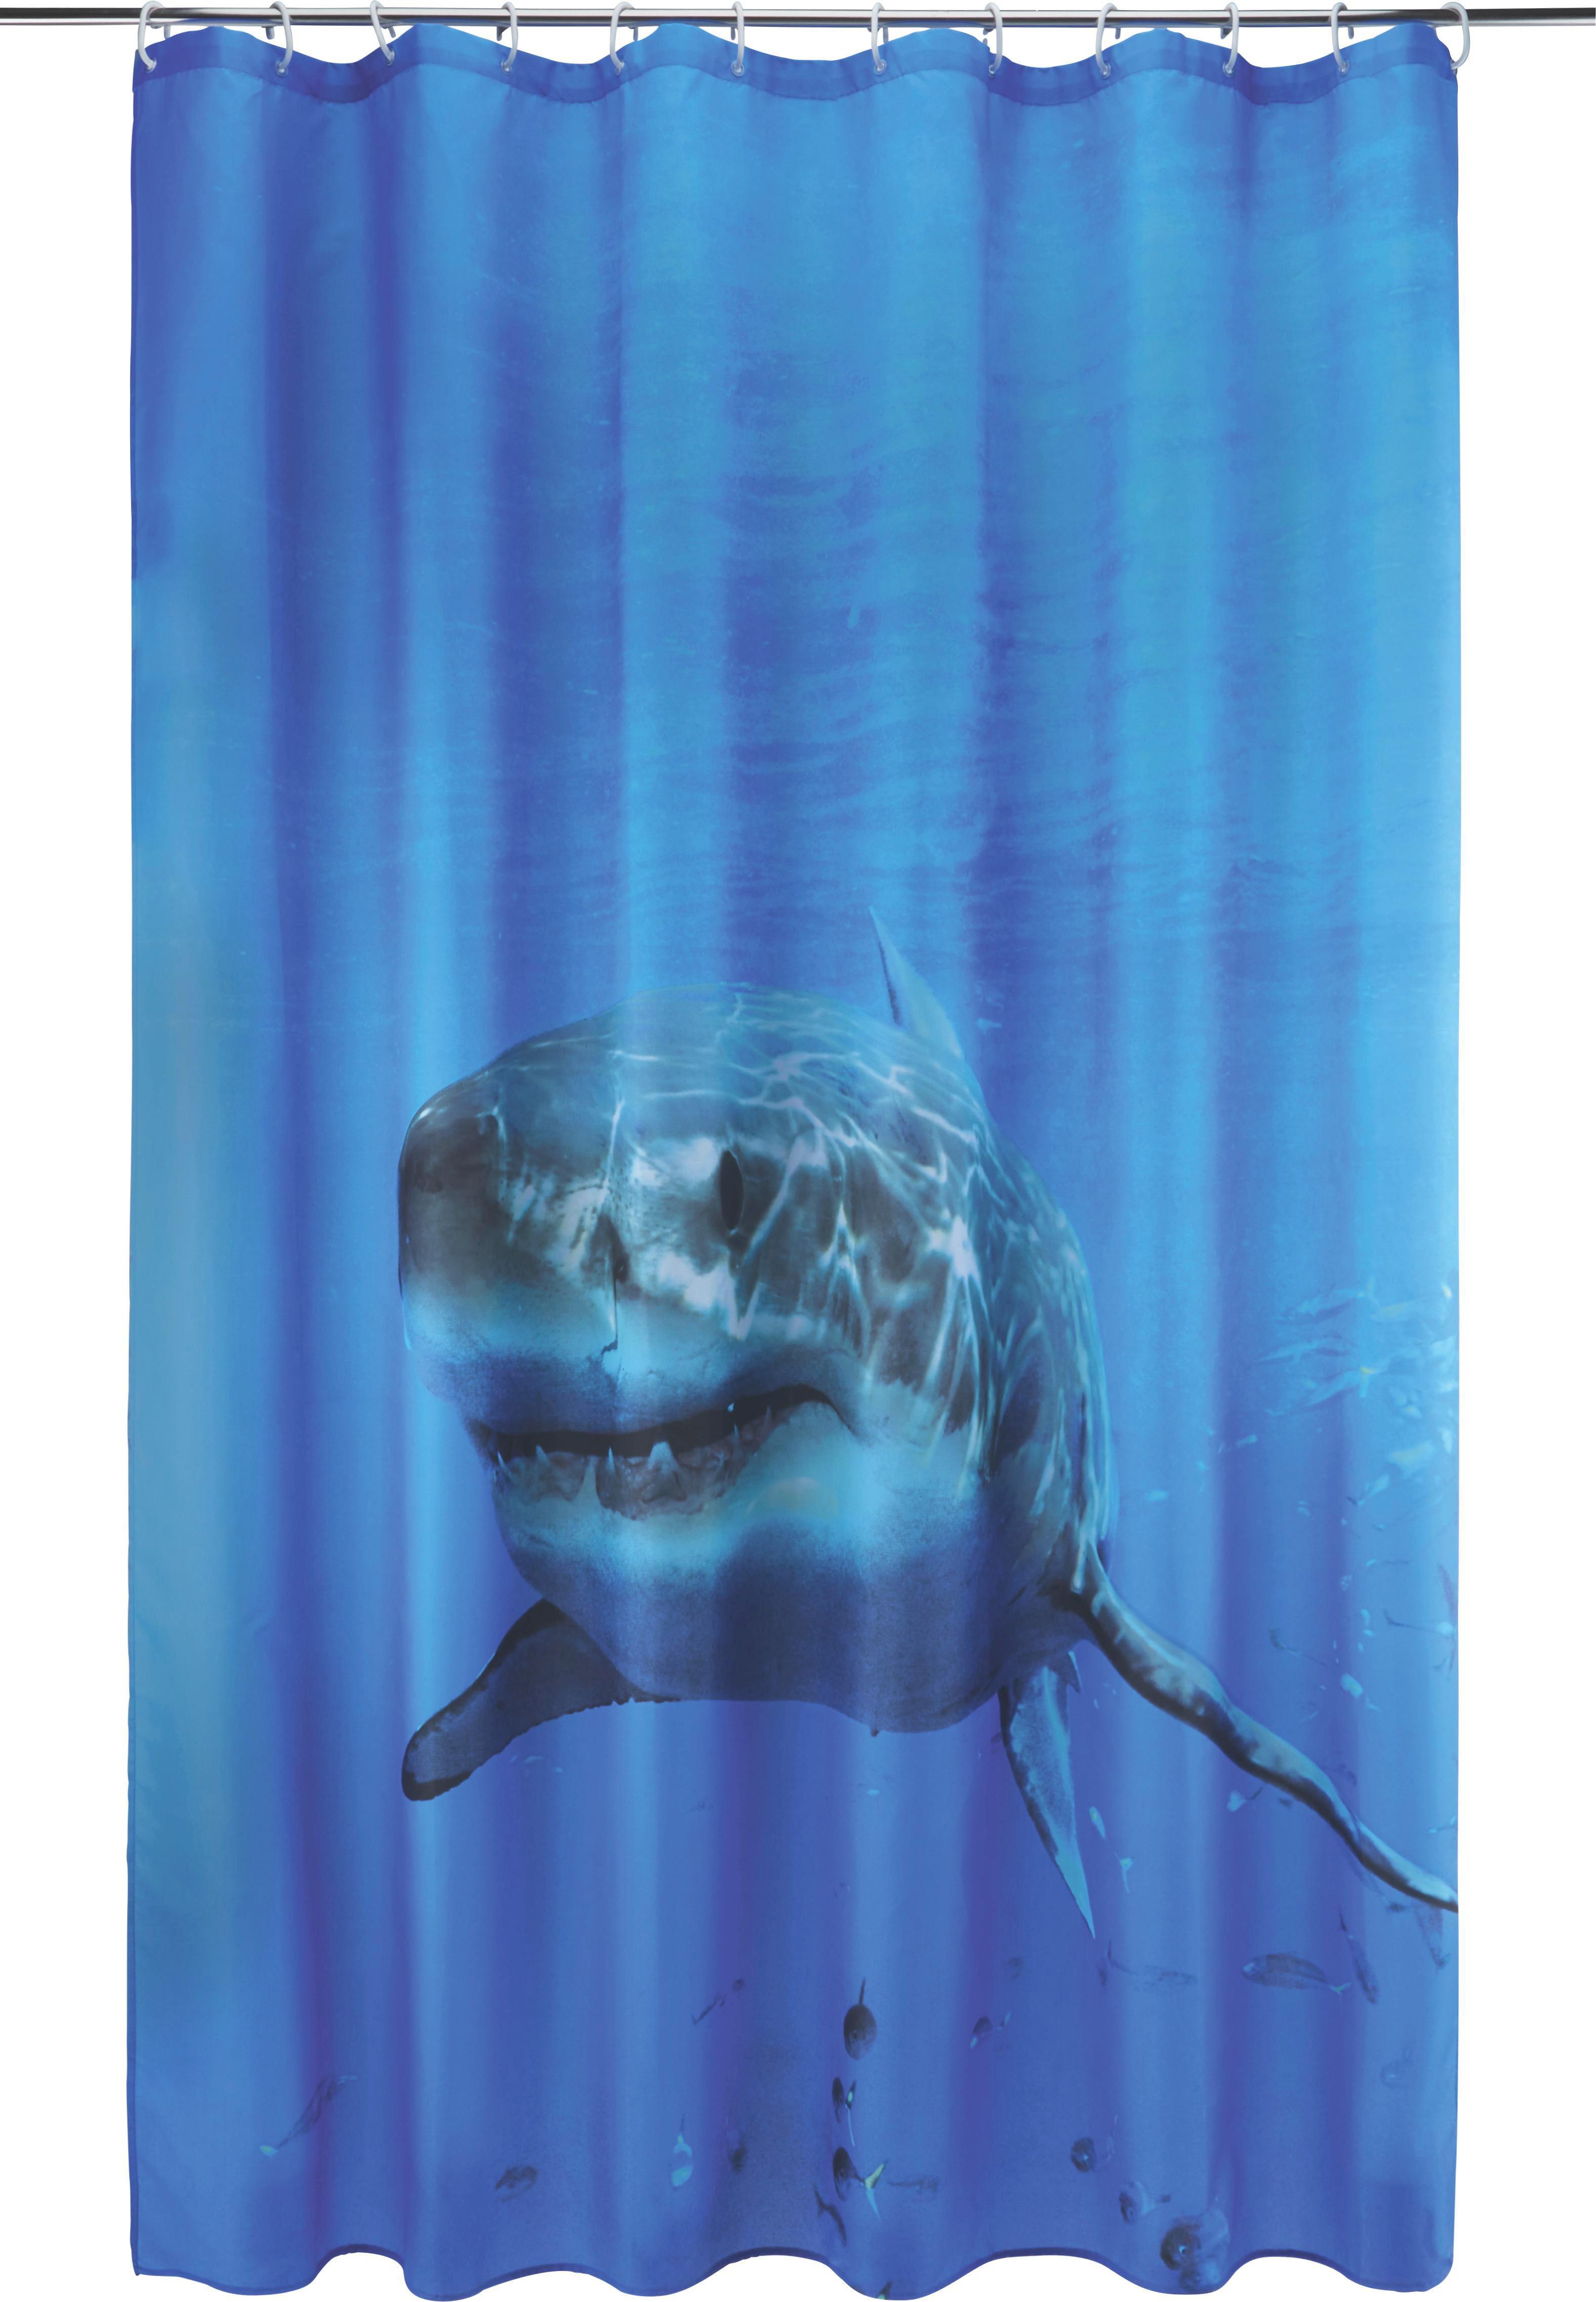 Duschvorhang Hai in Blau, ca. 180x200cm - Blau/Weiß, Textil (180/200cm) - MÖMAX modern living